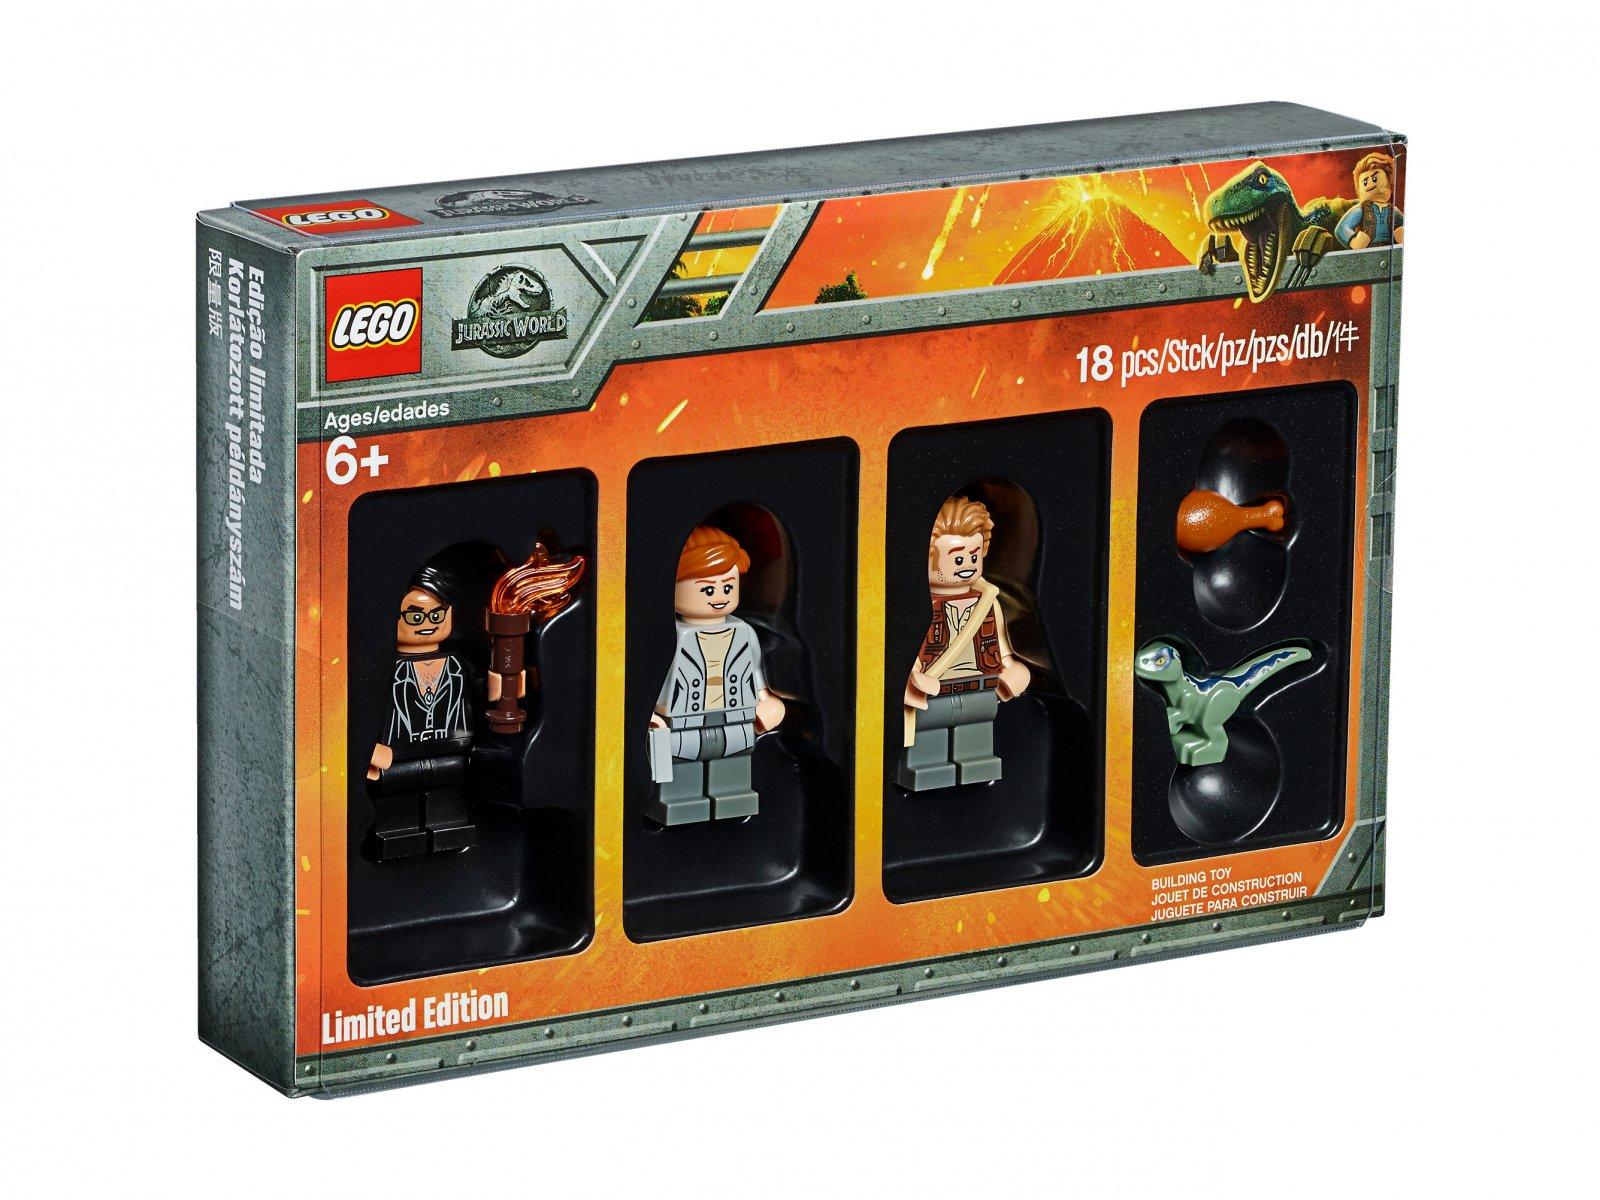 LEGO 5005255 Bricktober Jurassic World™